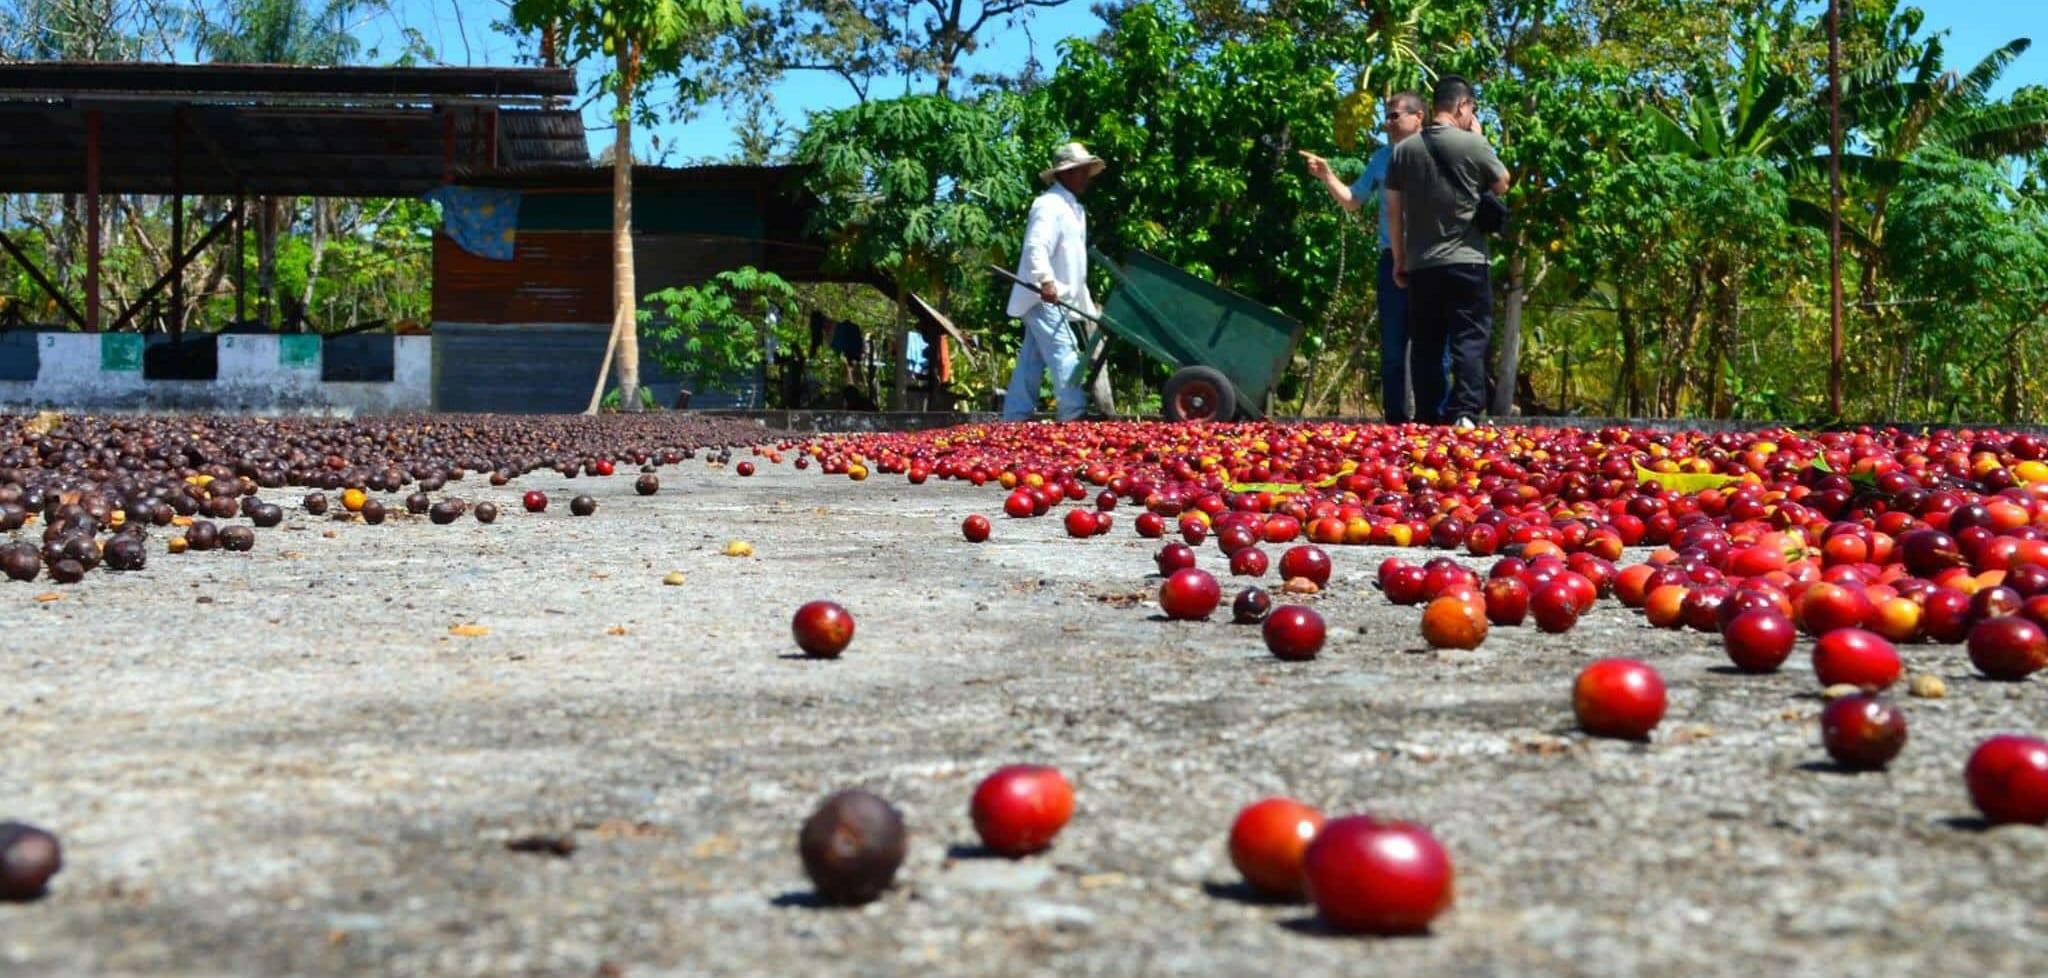 Coffee cherries drying on a patio